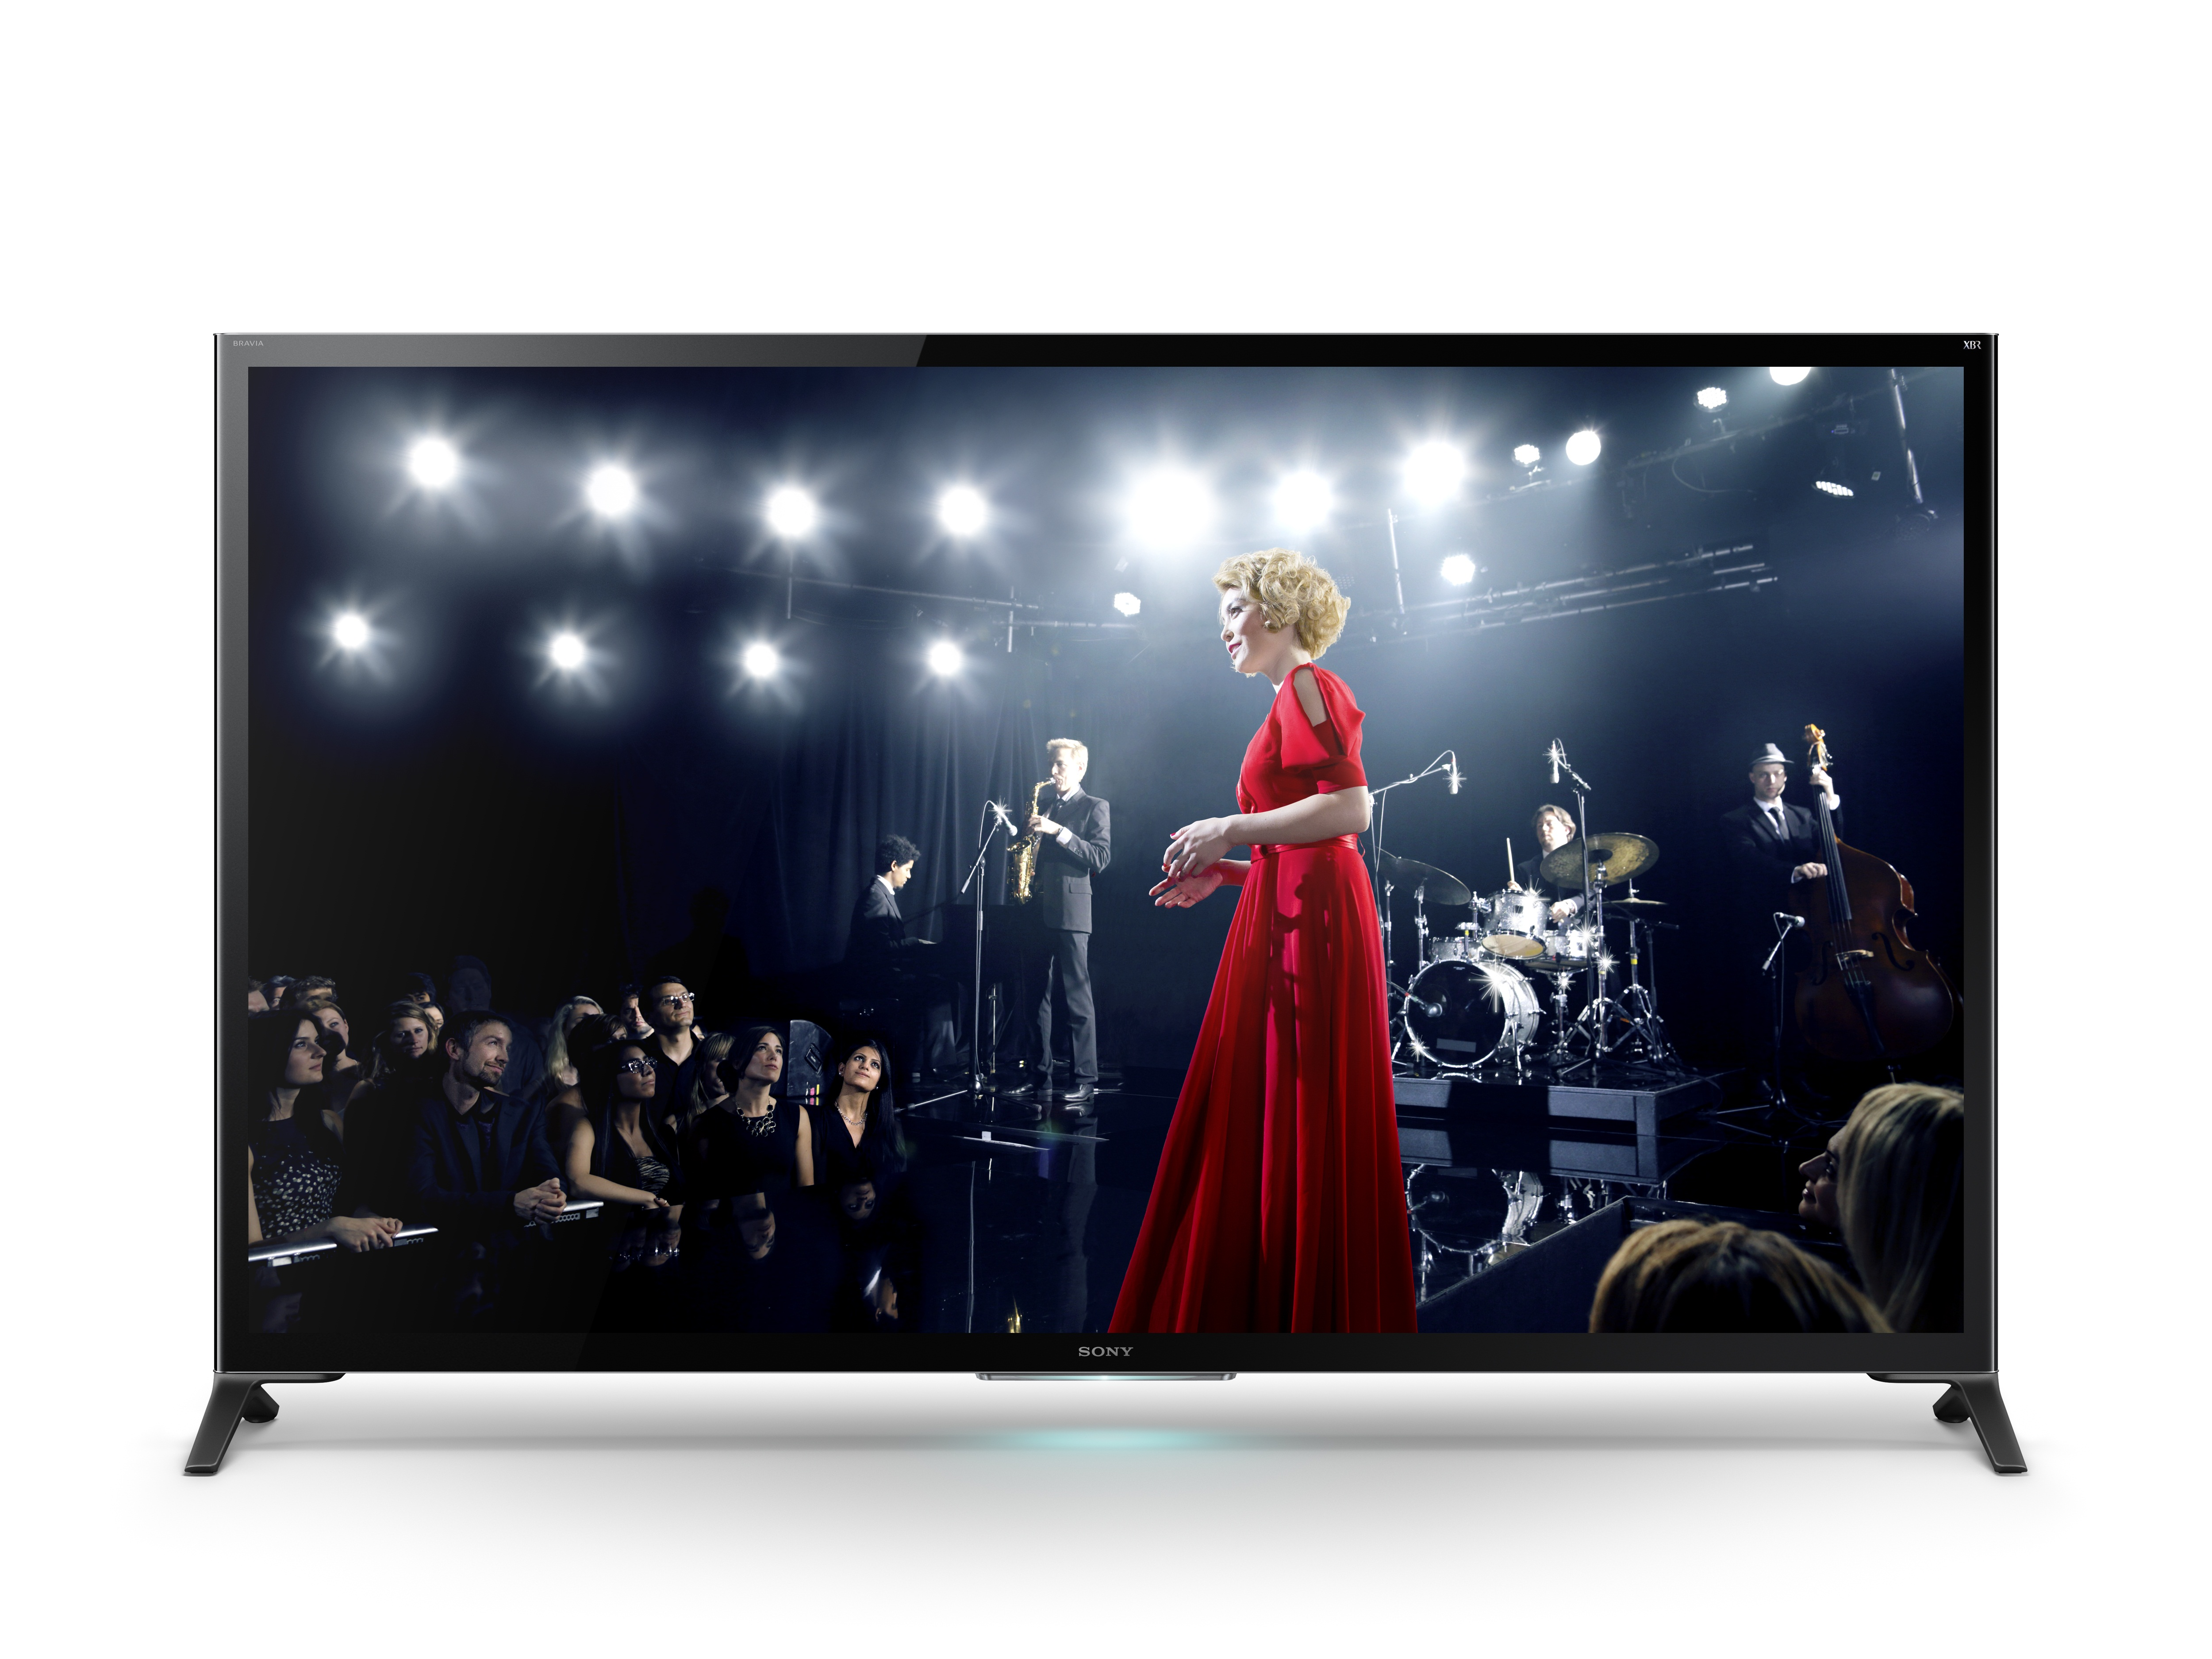 Sony X950B Series